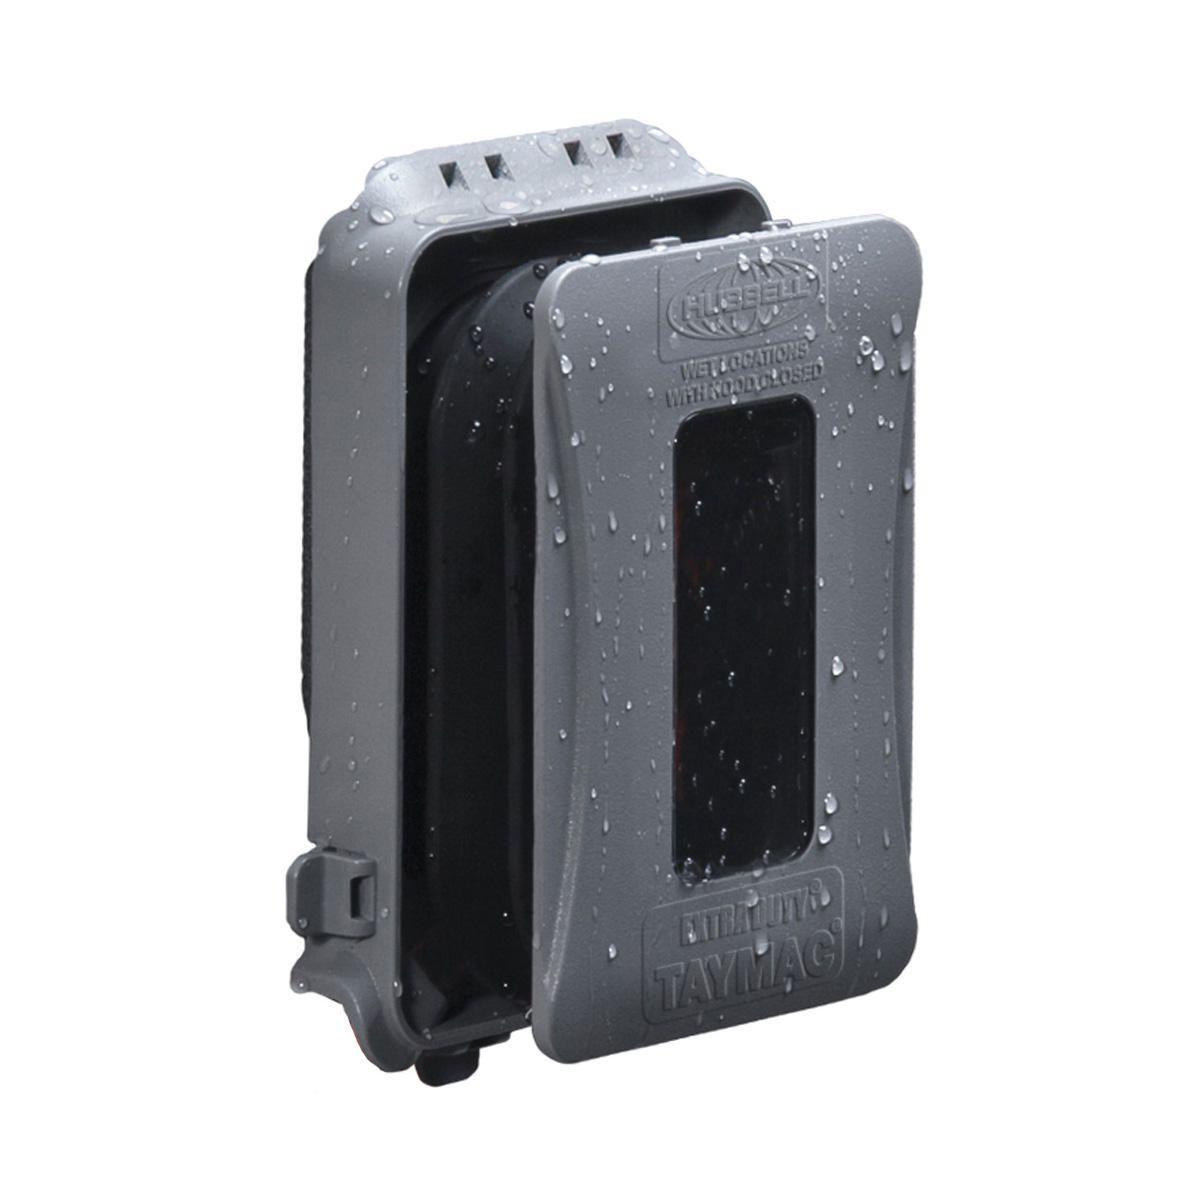 RACO,ML500G,1G WP EXTRA DUTY  EXPANDABLE WIU CVR GRY